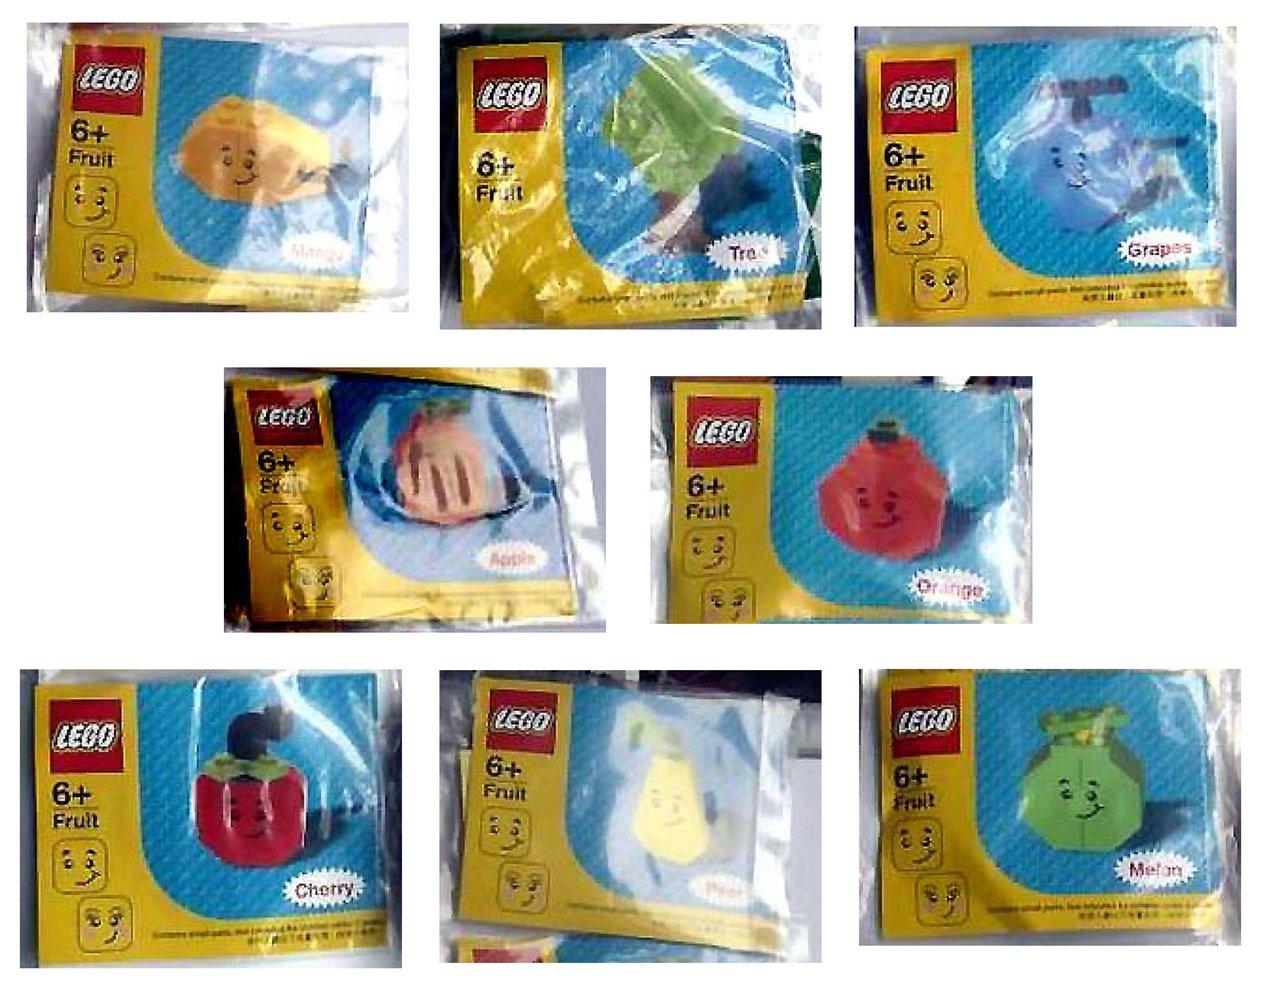 Fruit Set - Hong Kong Lego Show Promotional